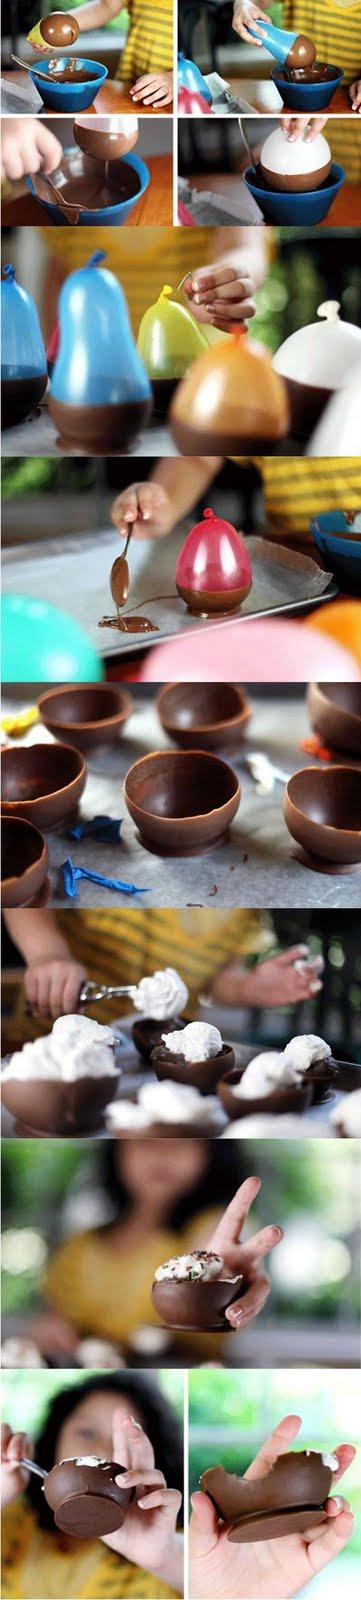 Potes de chocolate